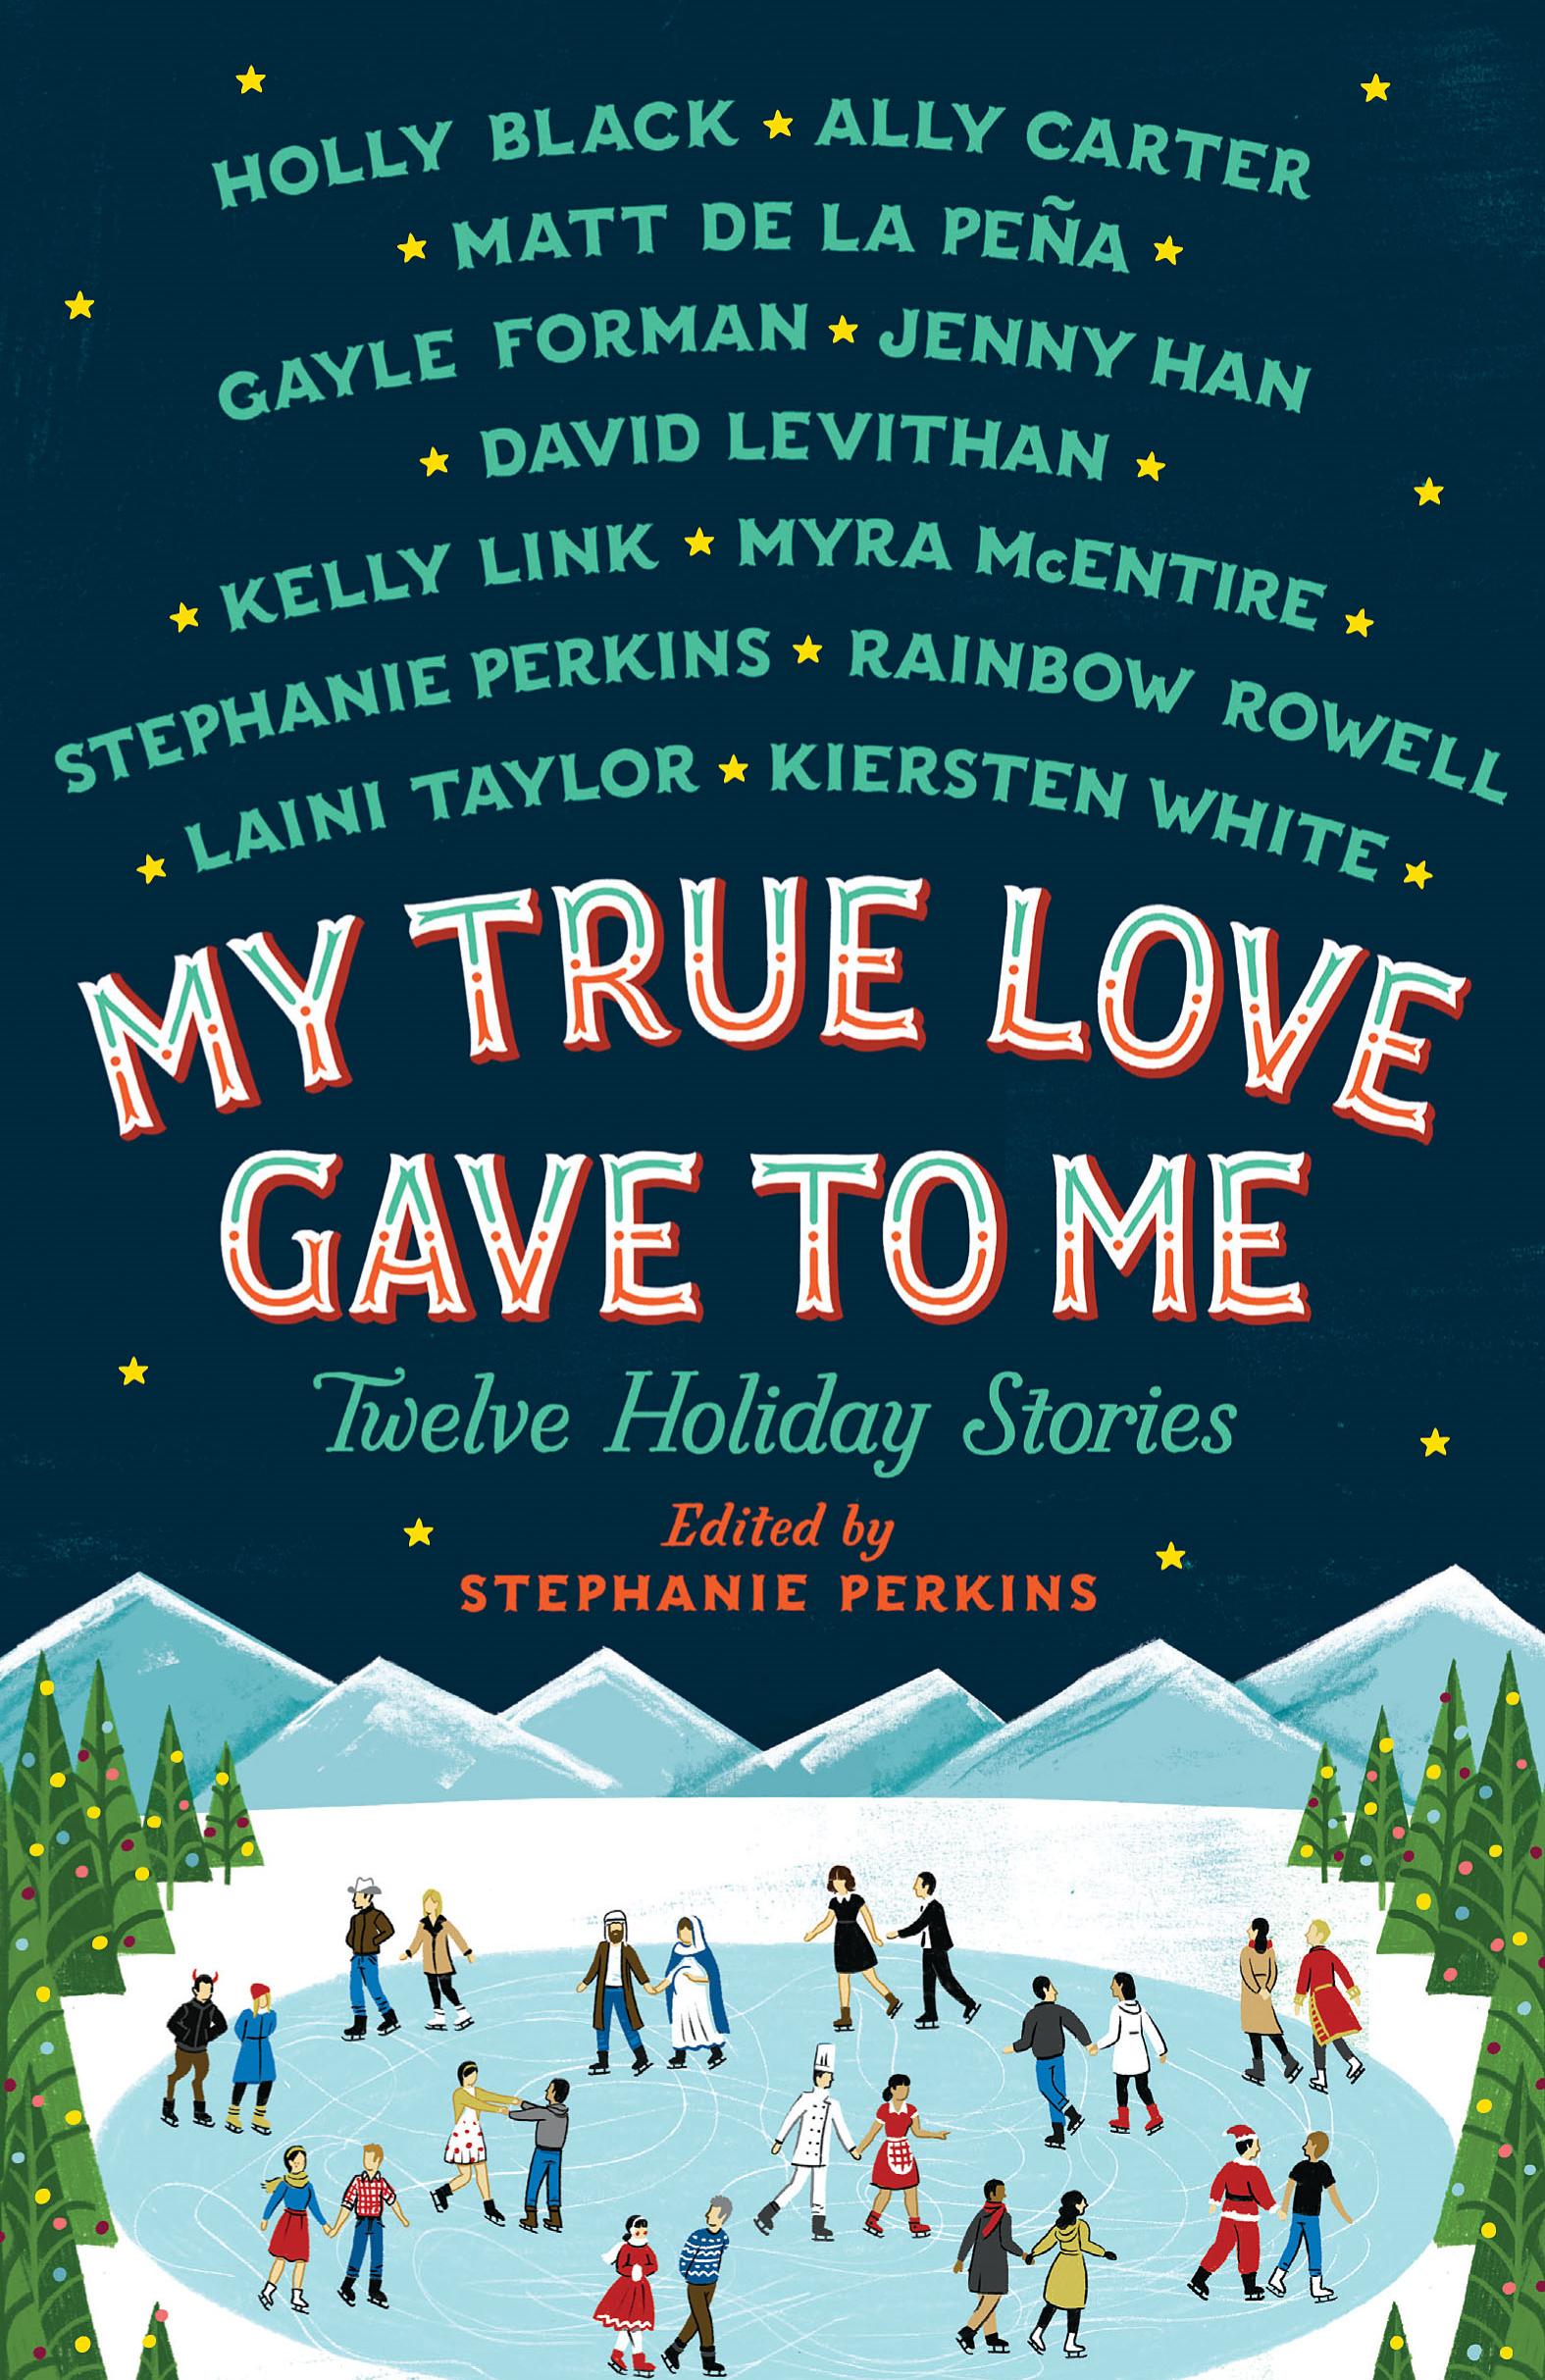 My-True-Love-Gave-to-Me edited by stephanie perkins.jpg